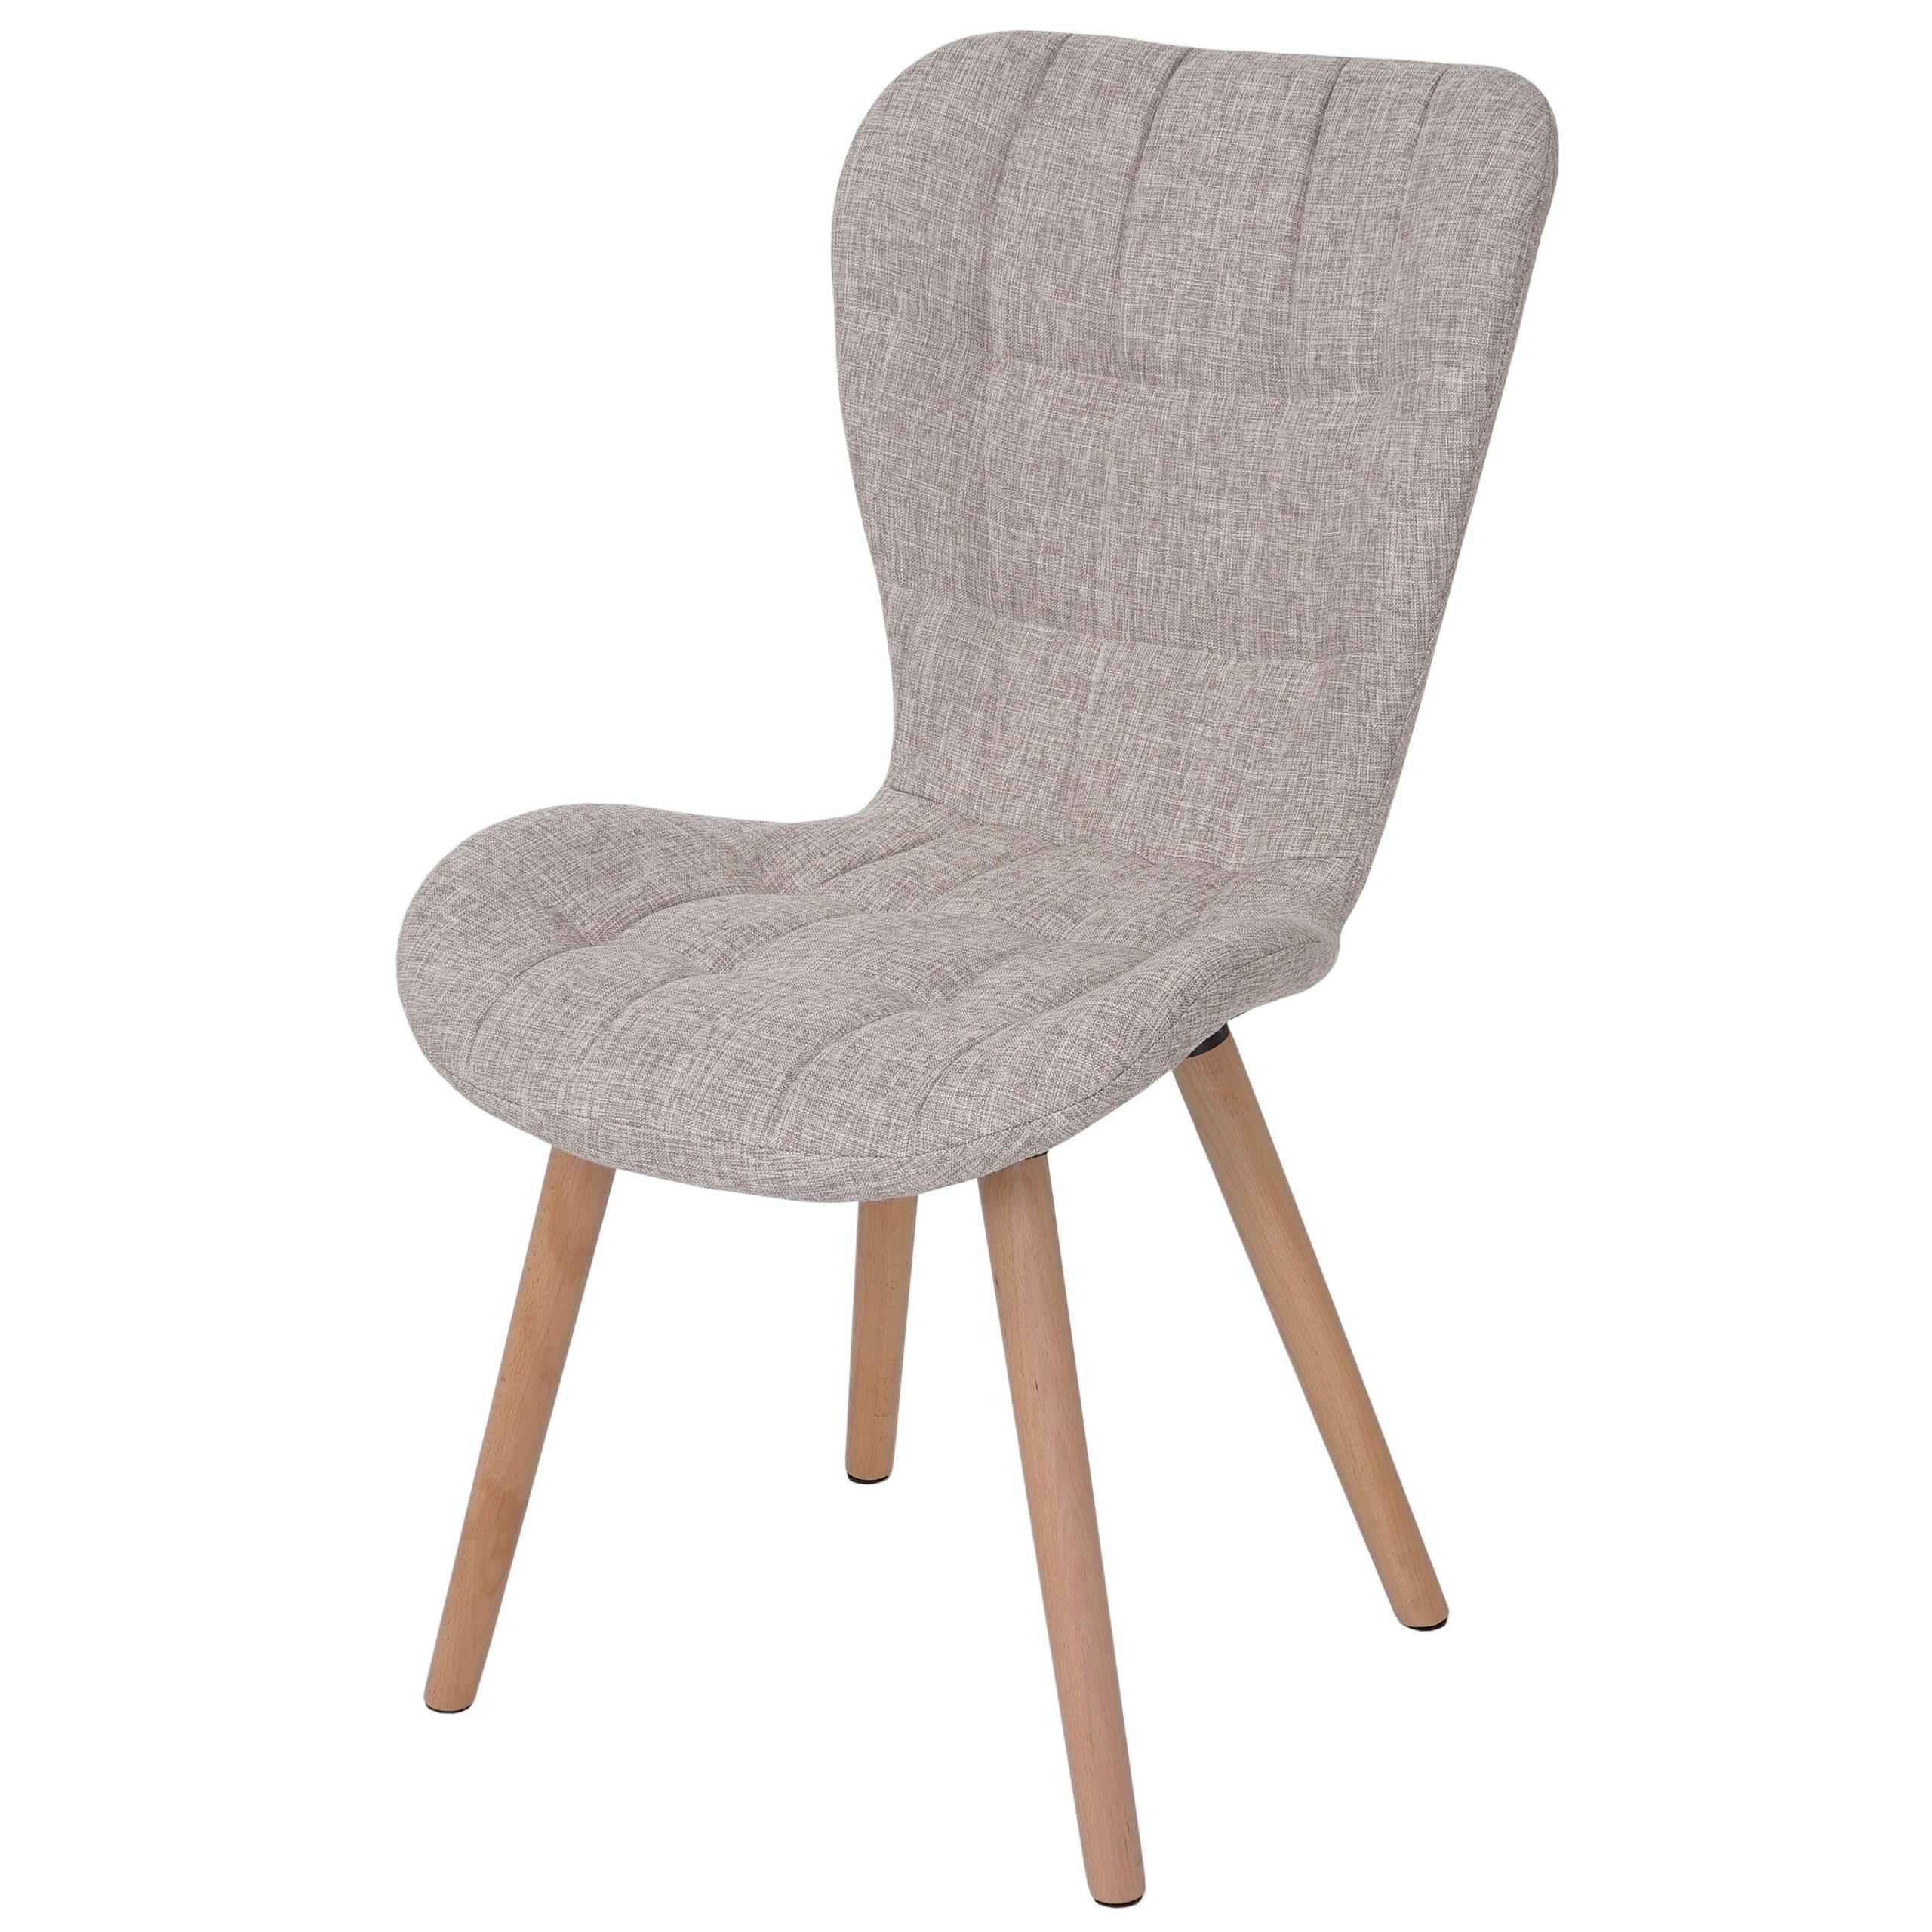 6x esszimmerstuhl hwc a87 stuhl lehnstuhl retro 50er for Stuhl designgeschichte